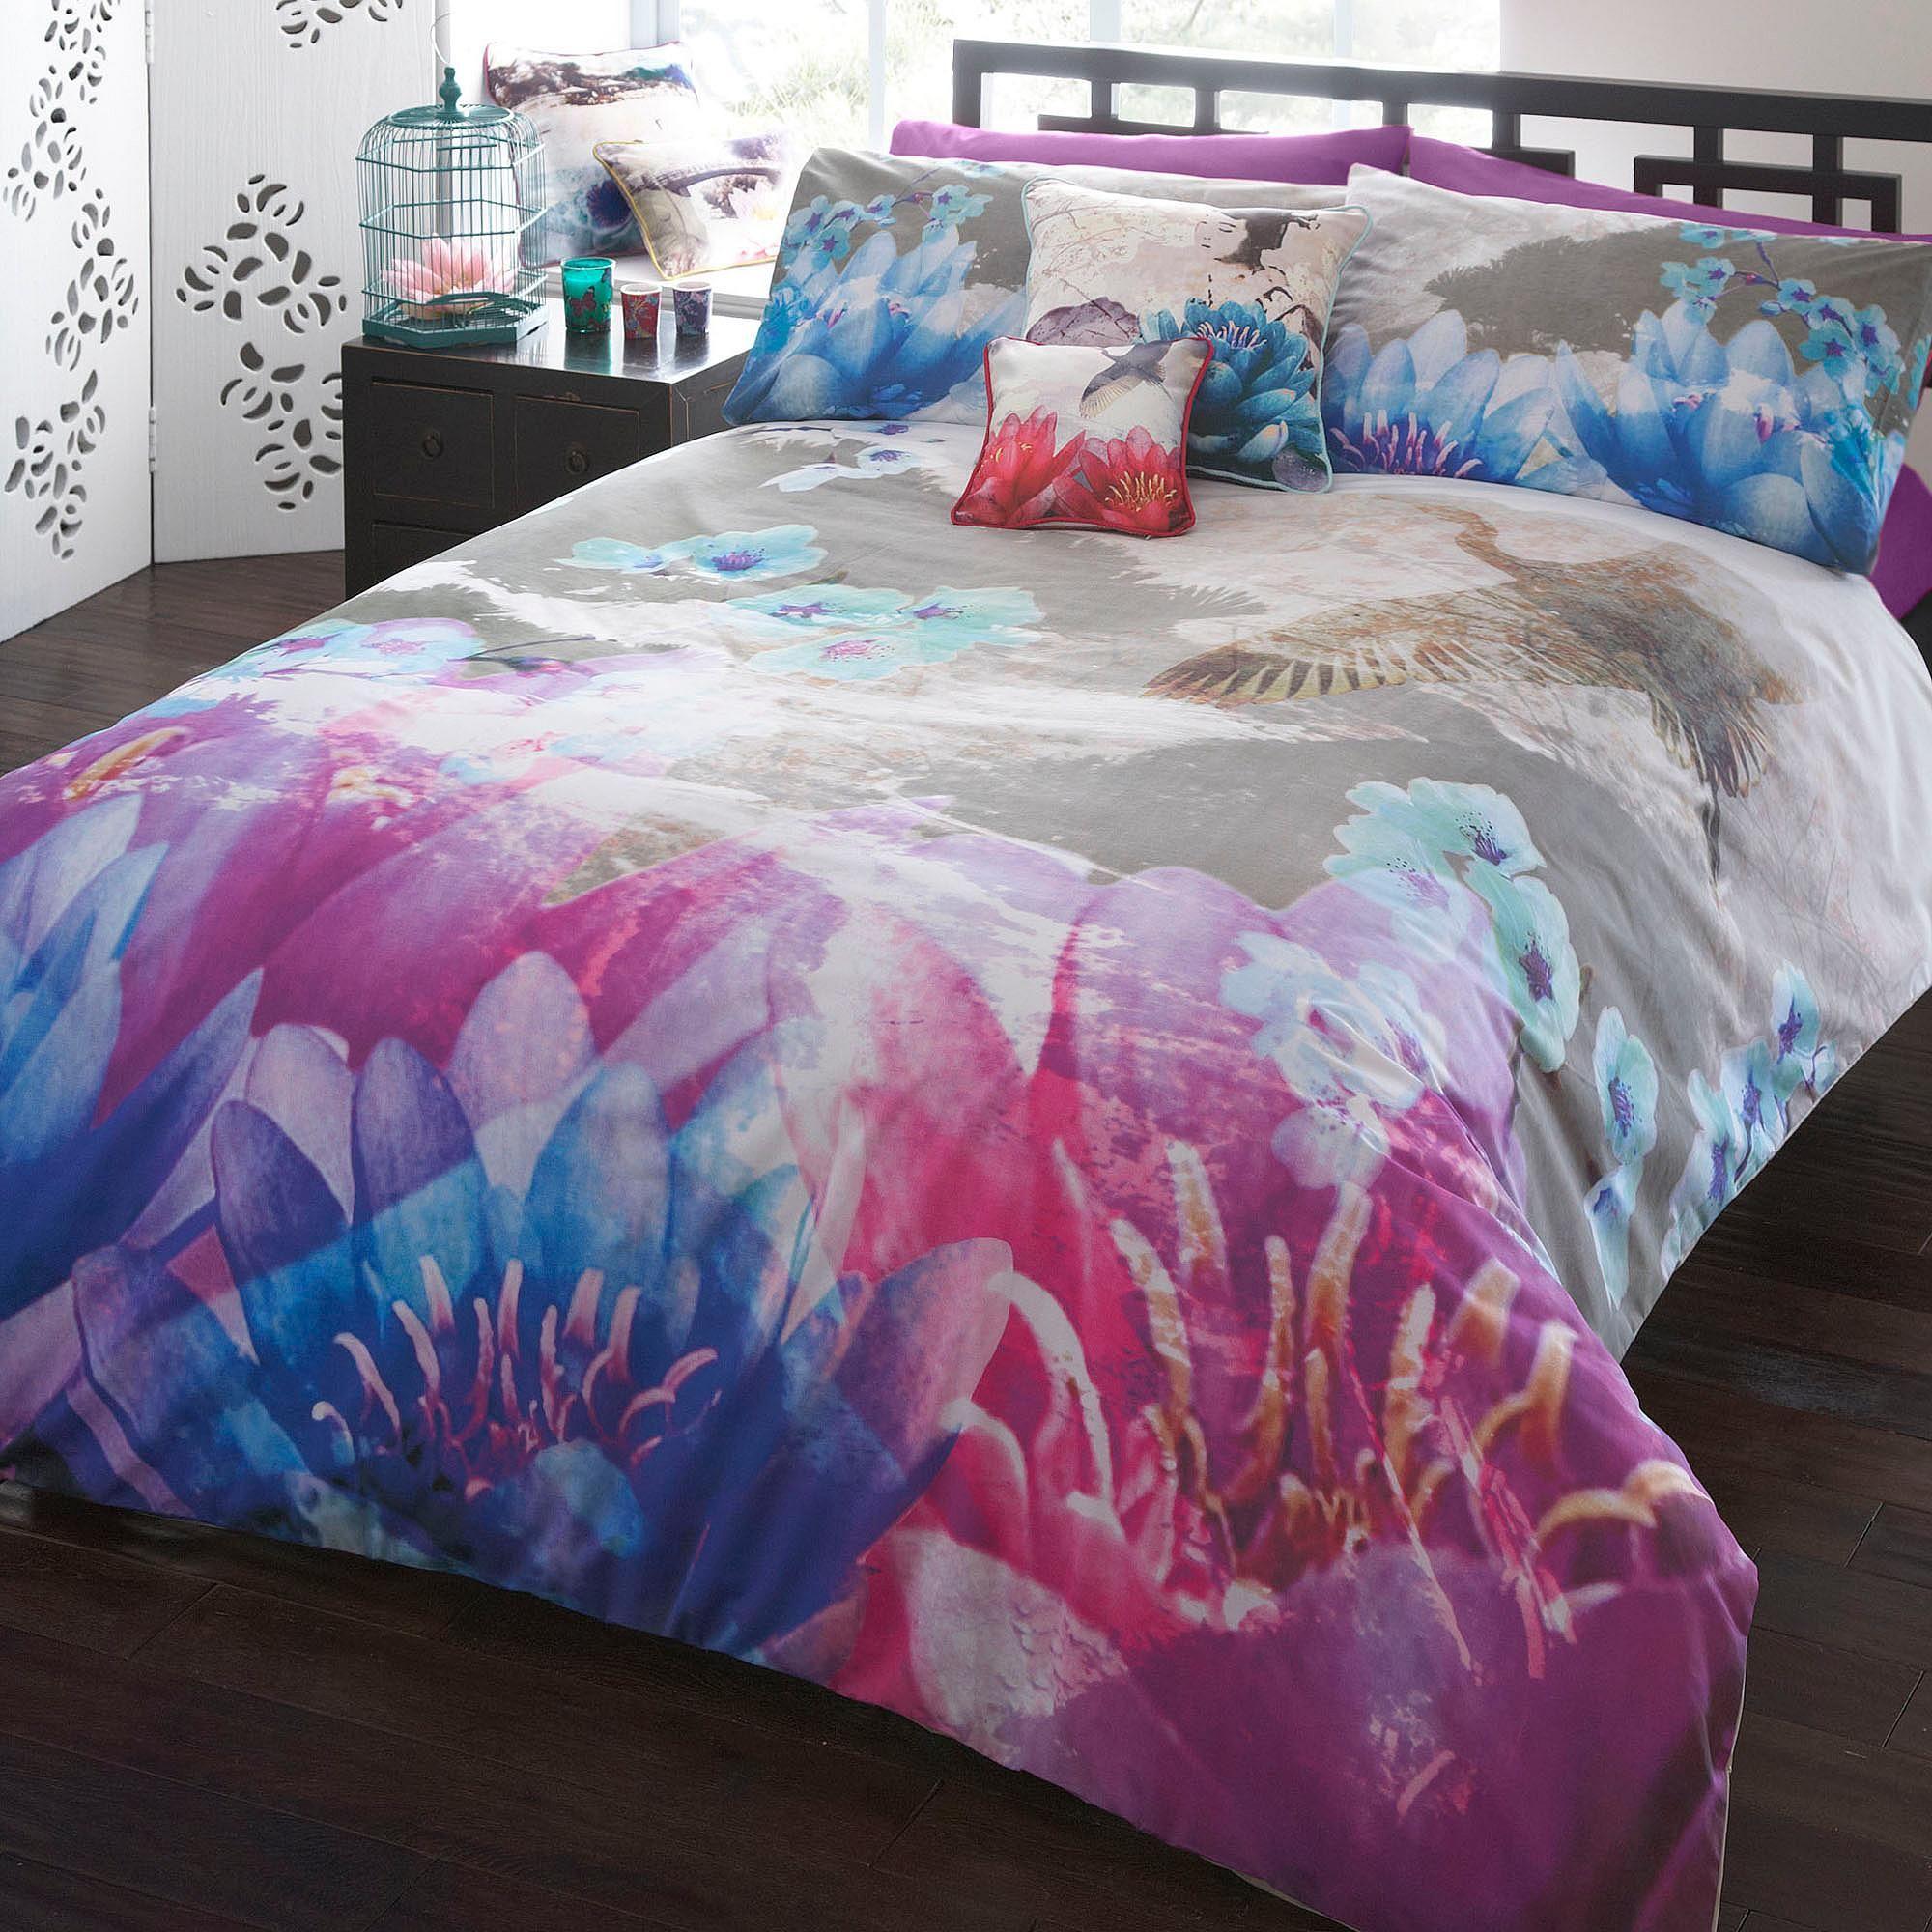 Designer purple lotus bedding set - Home & furniture ...